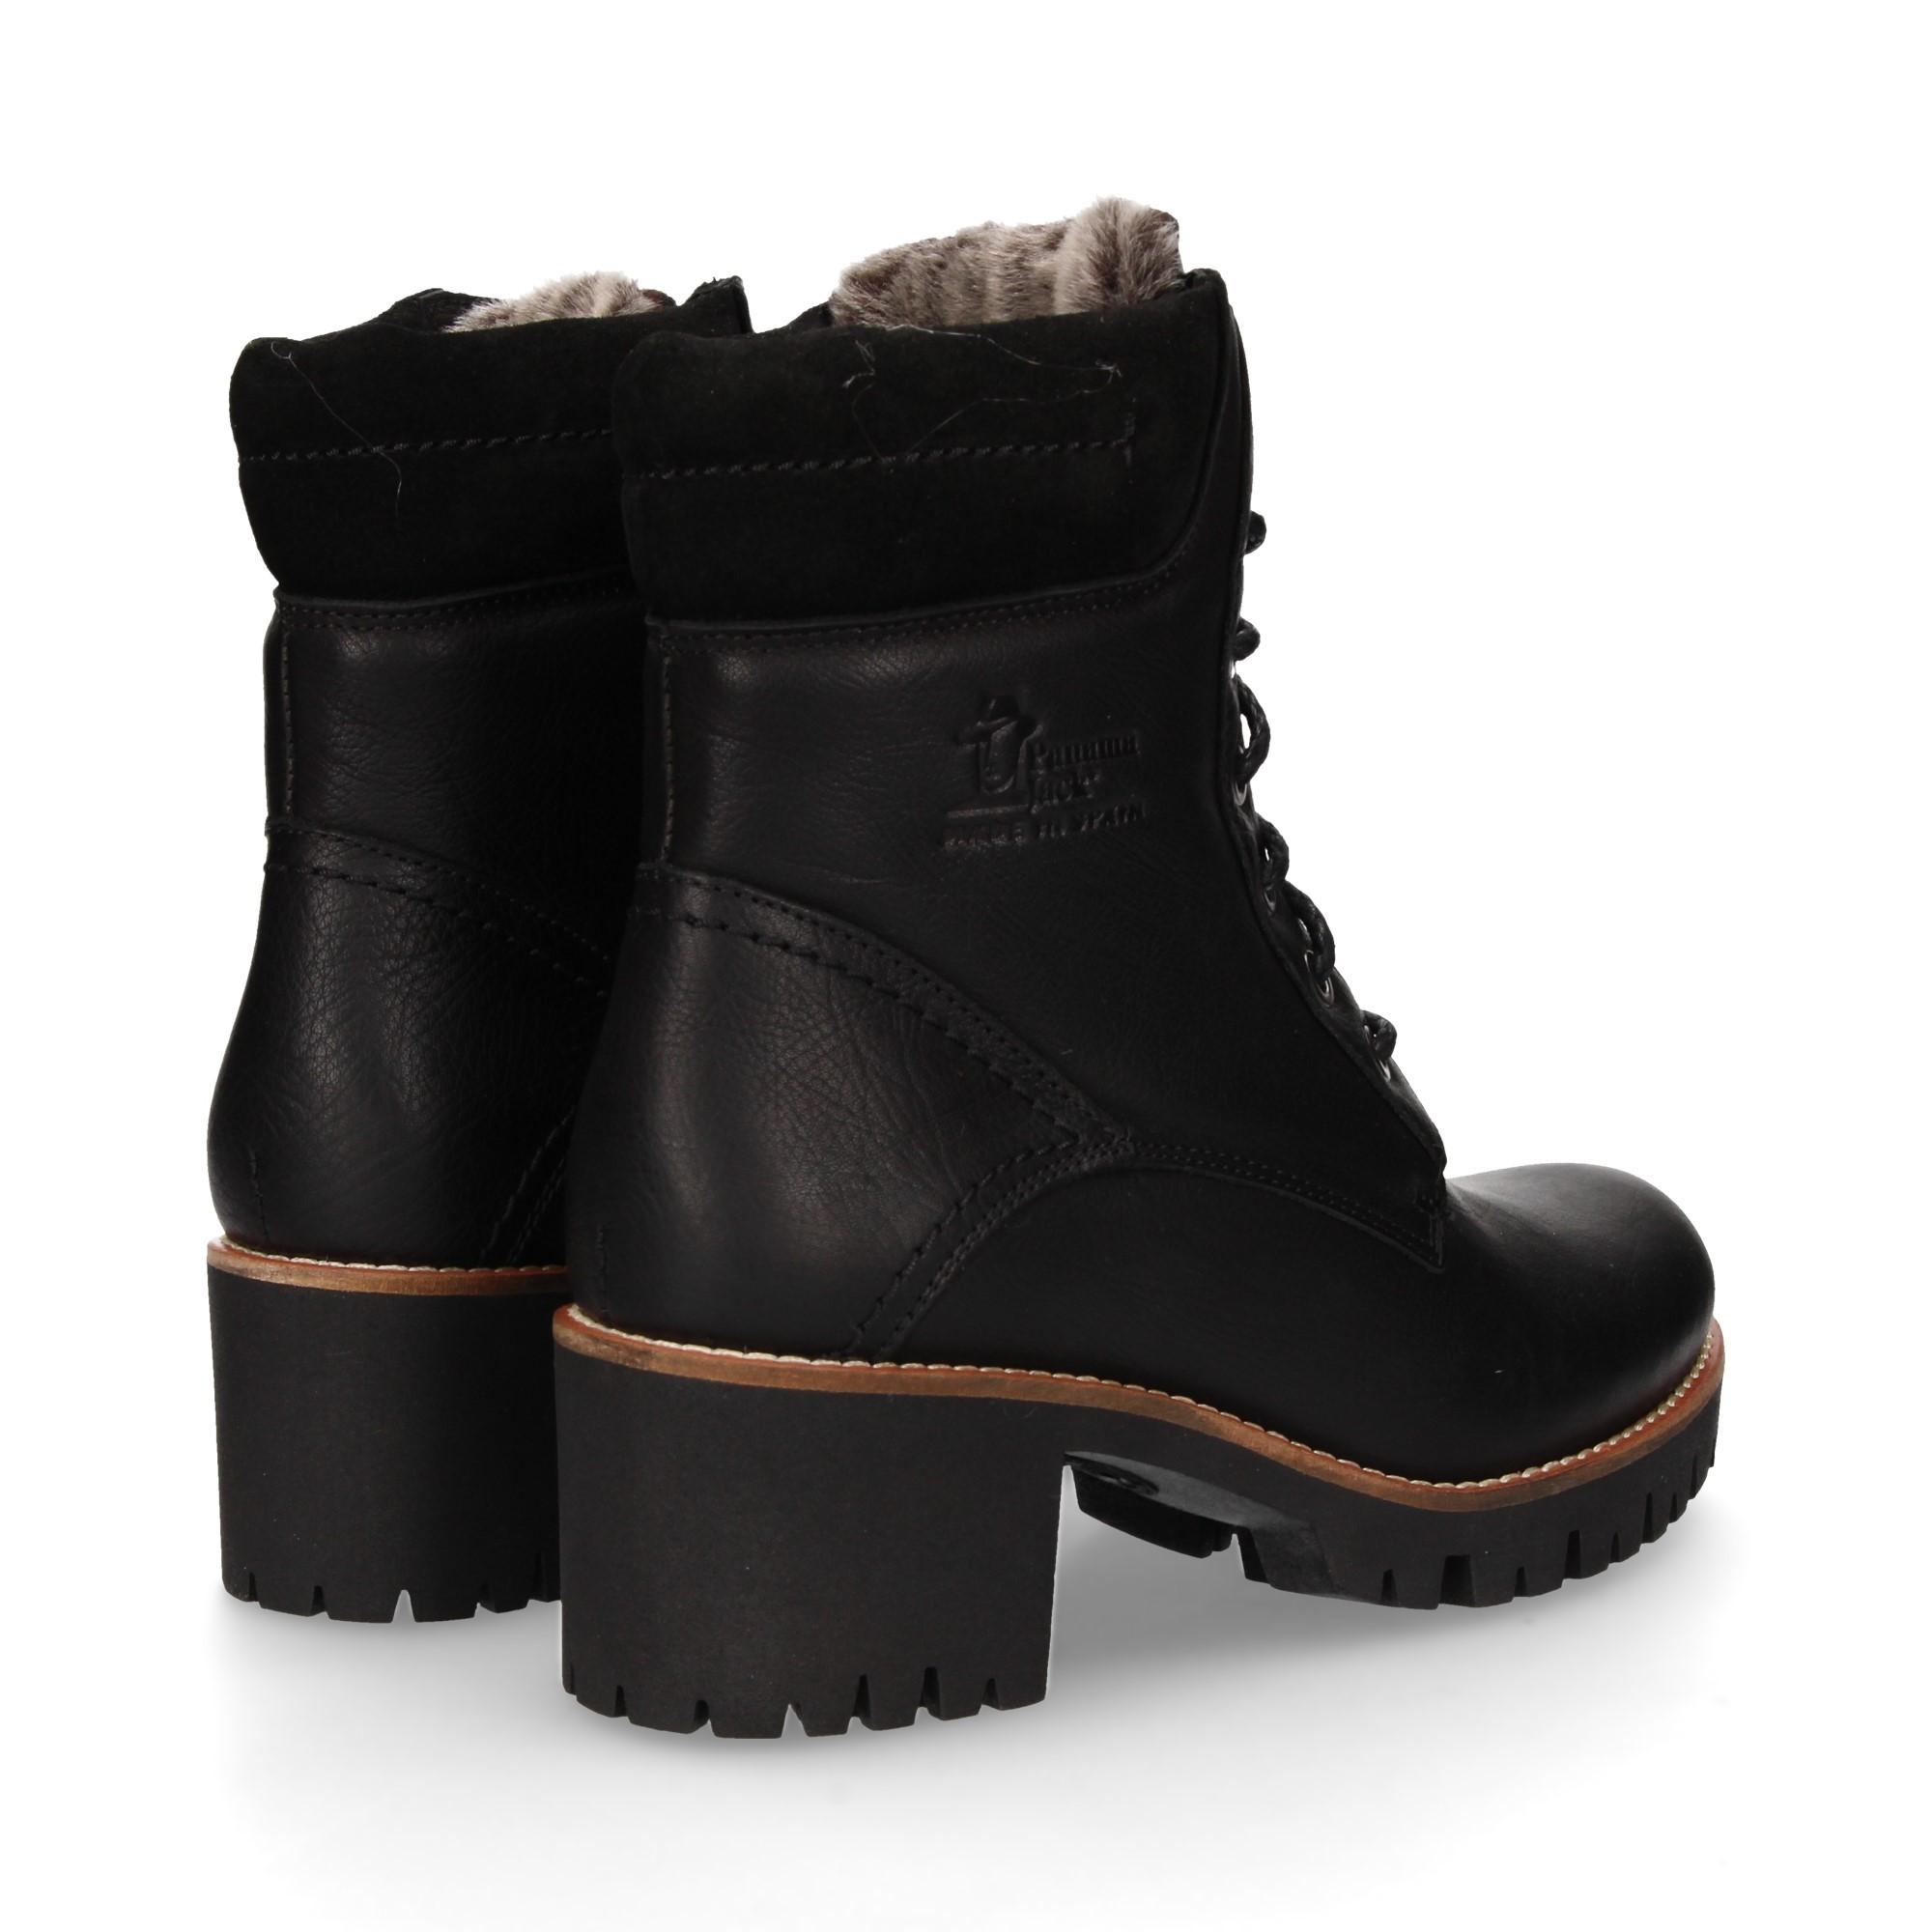 58d413aa67600 PANAMA JACK Women s Heeled ankle boots PHOEBE B17 NAPA NEGRO